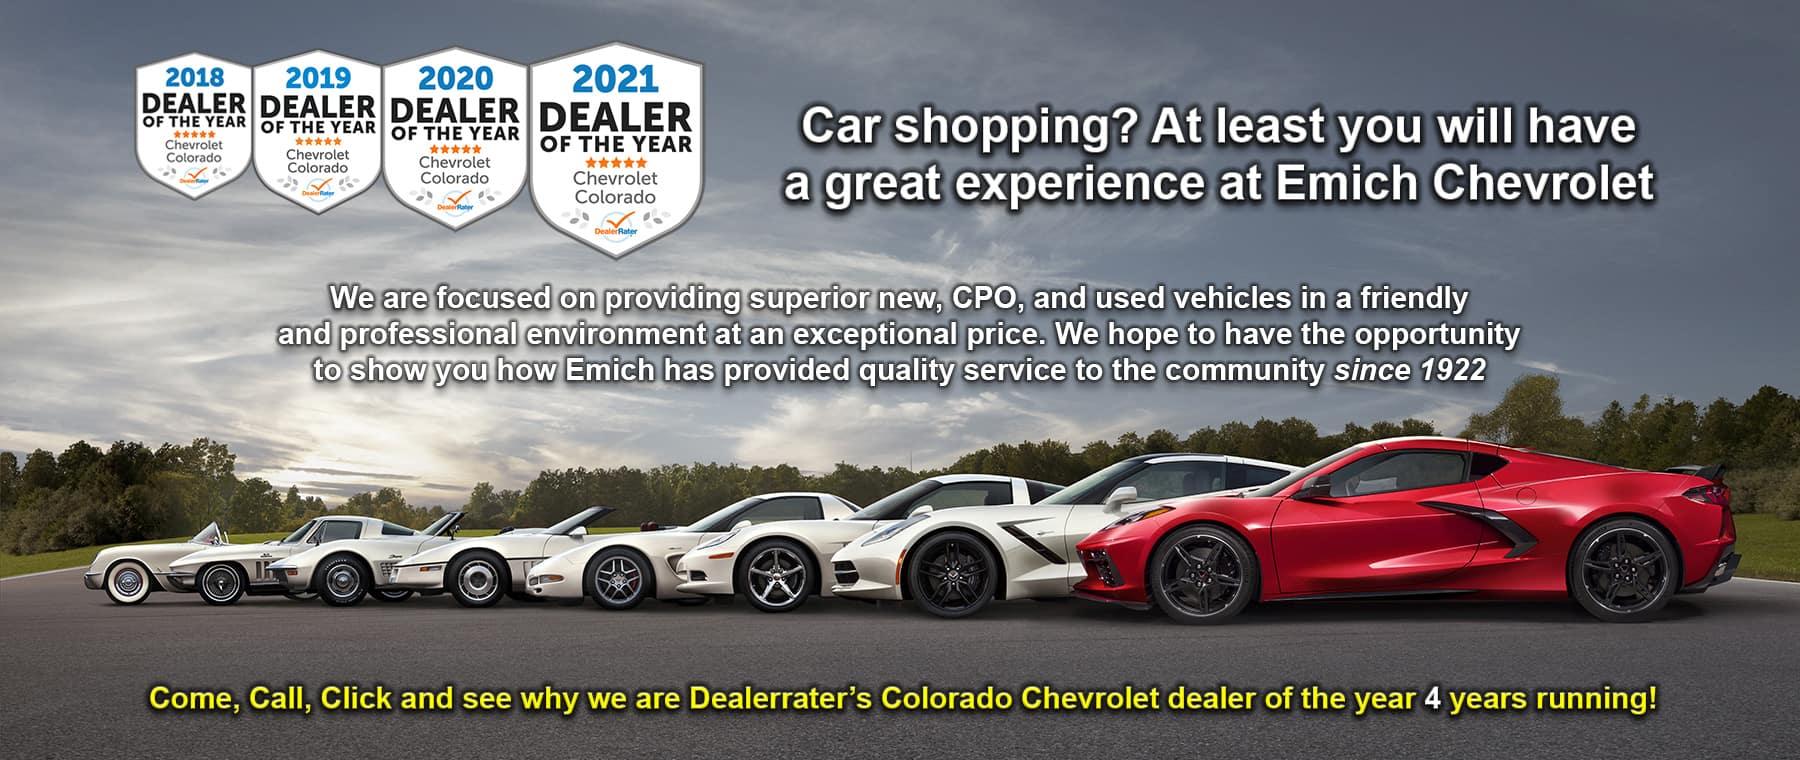 Colorado Chevrolet Dealer of the Year 2021!